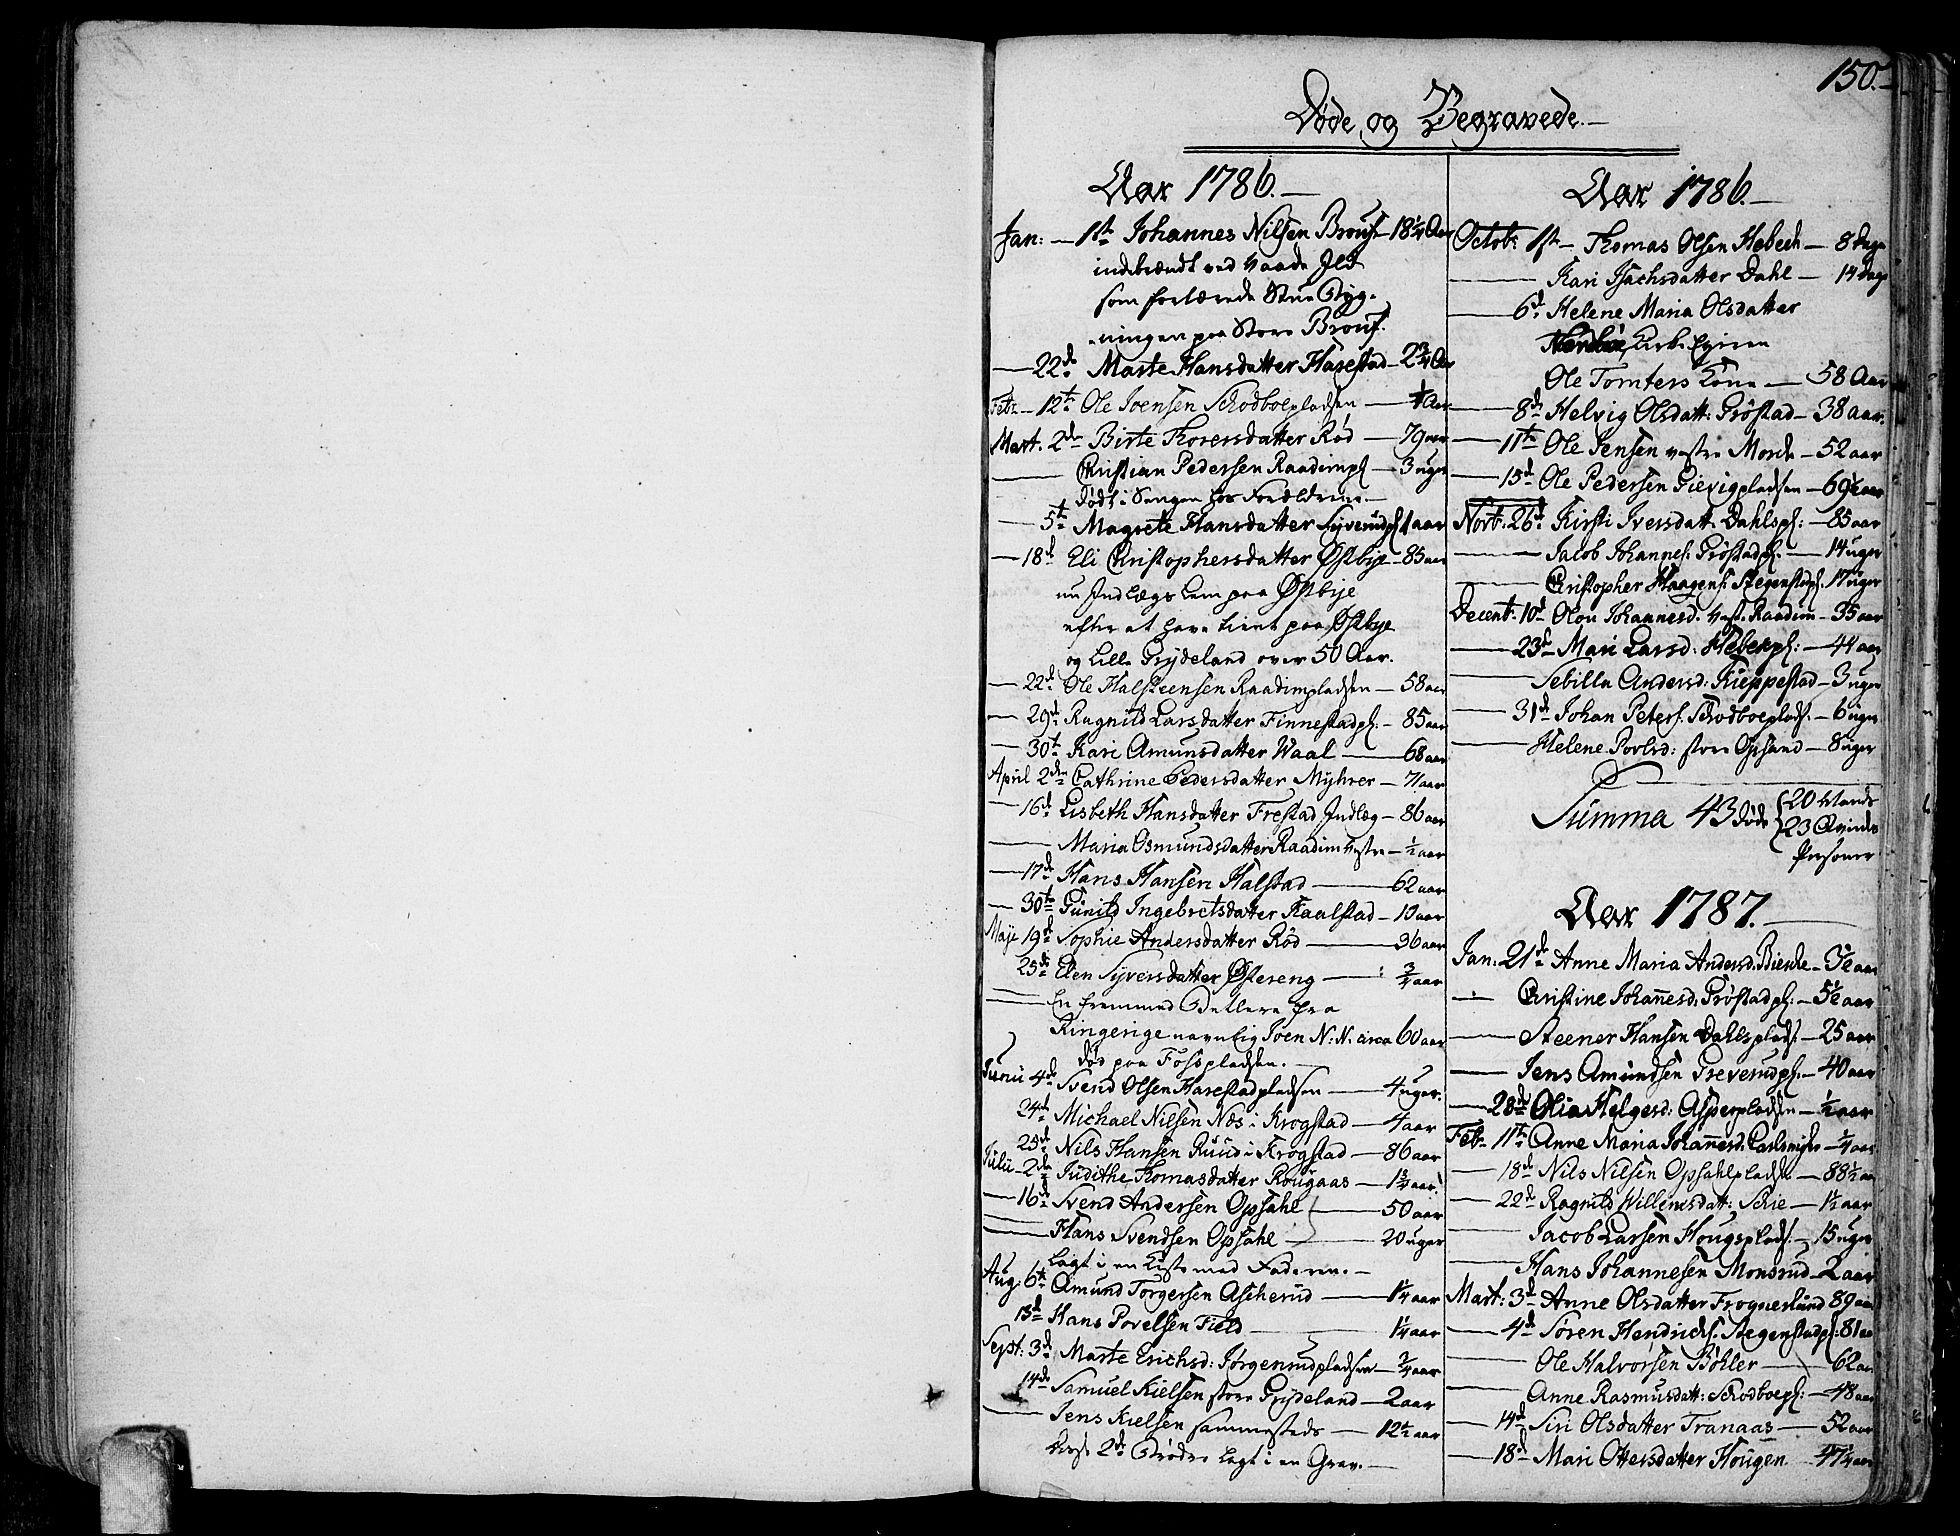 SAO, Kråkstad prestekontor Kirkebøker, Ministerialbok nr. I 2, 1786-1814, s. 150